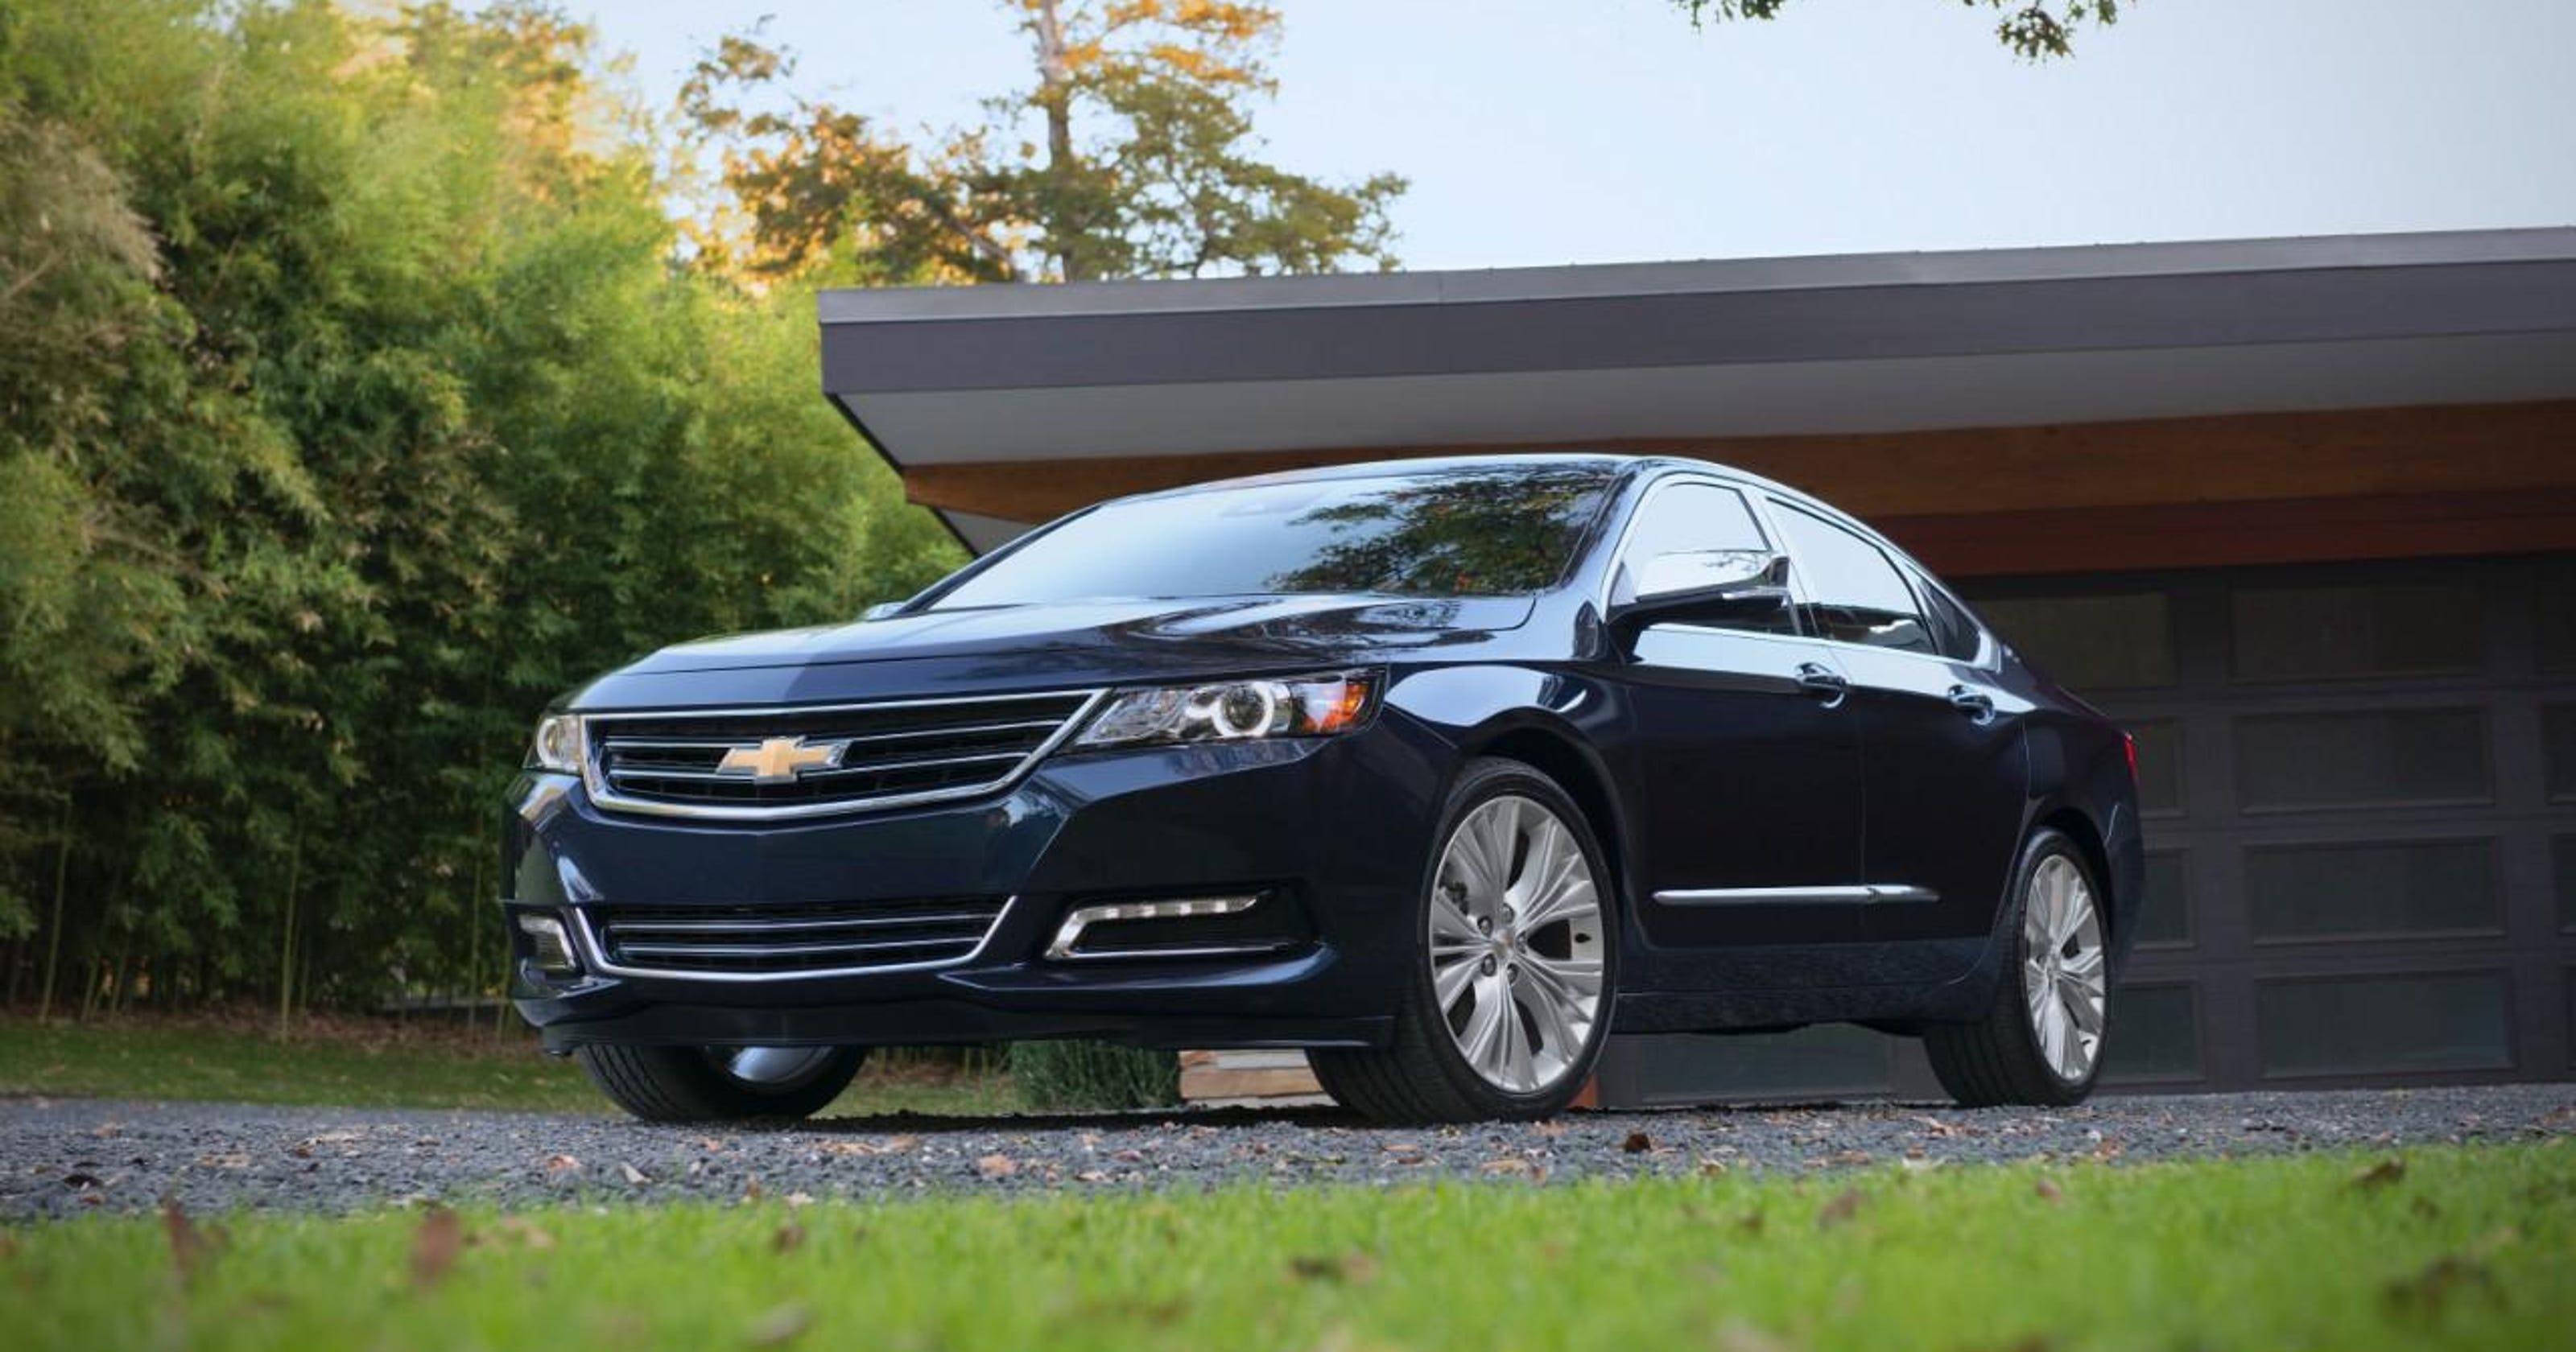 GM recalling 2014-15 Impalas over air bag fears